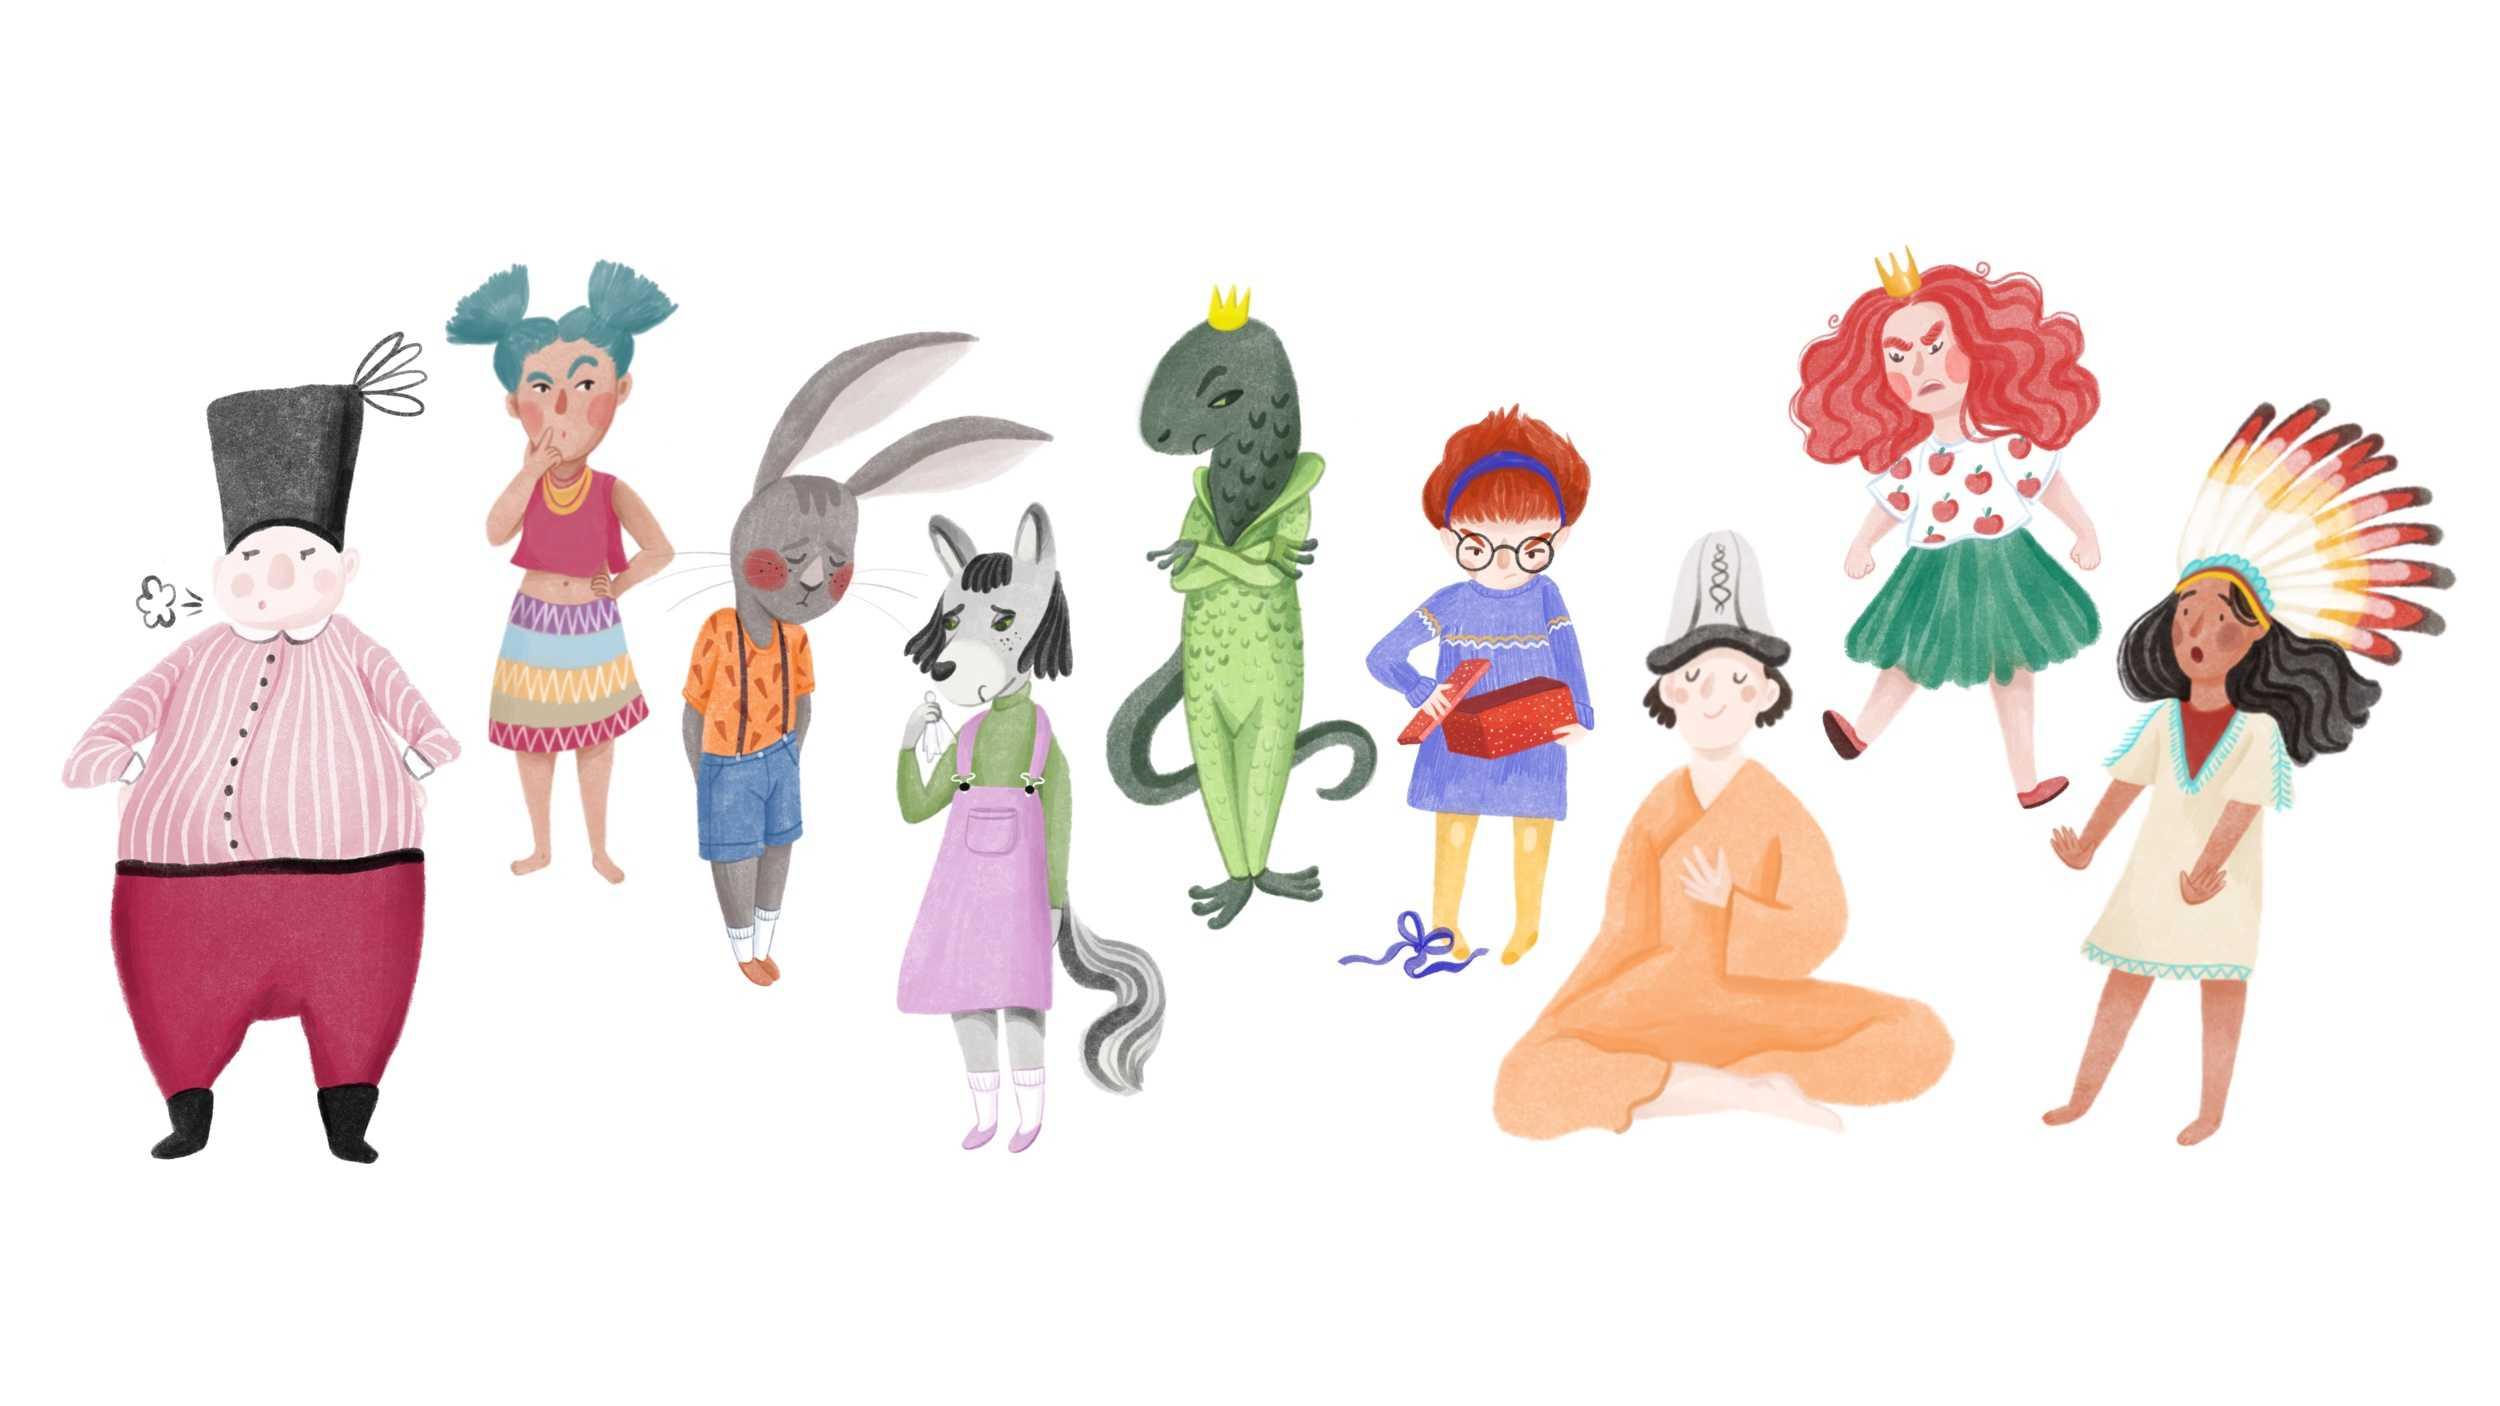 Ilustracja do bajki postacie